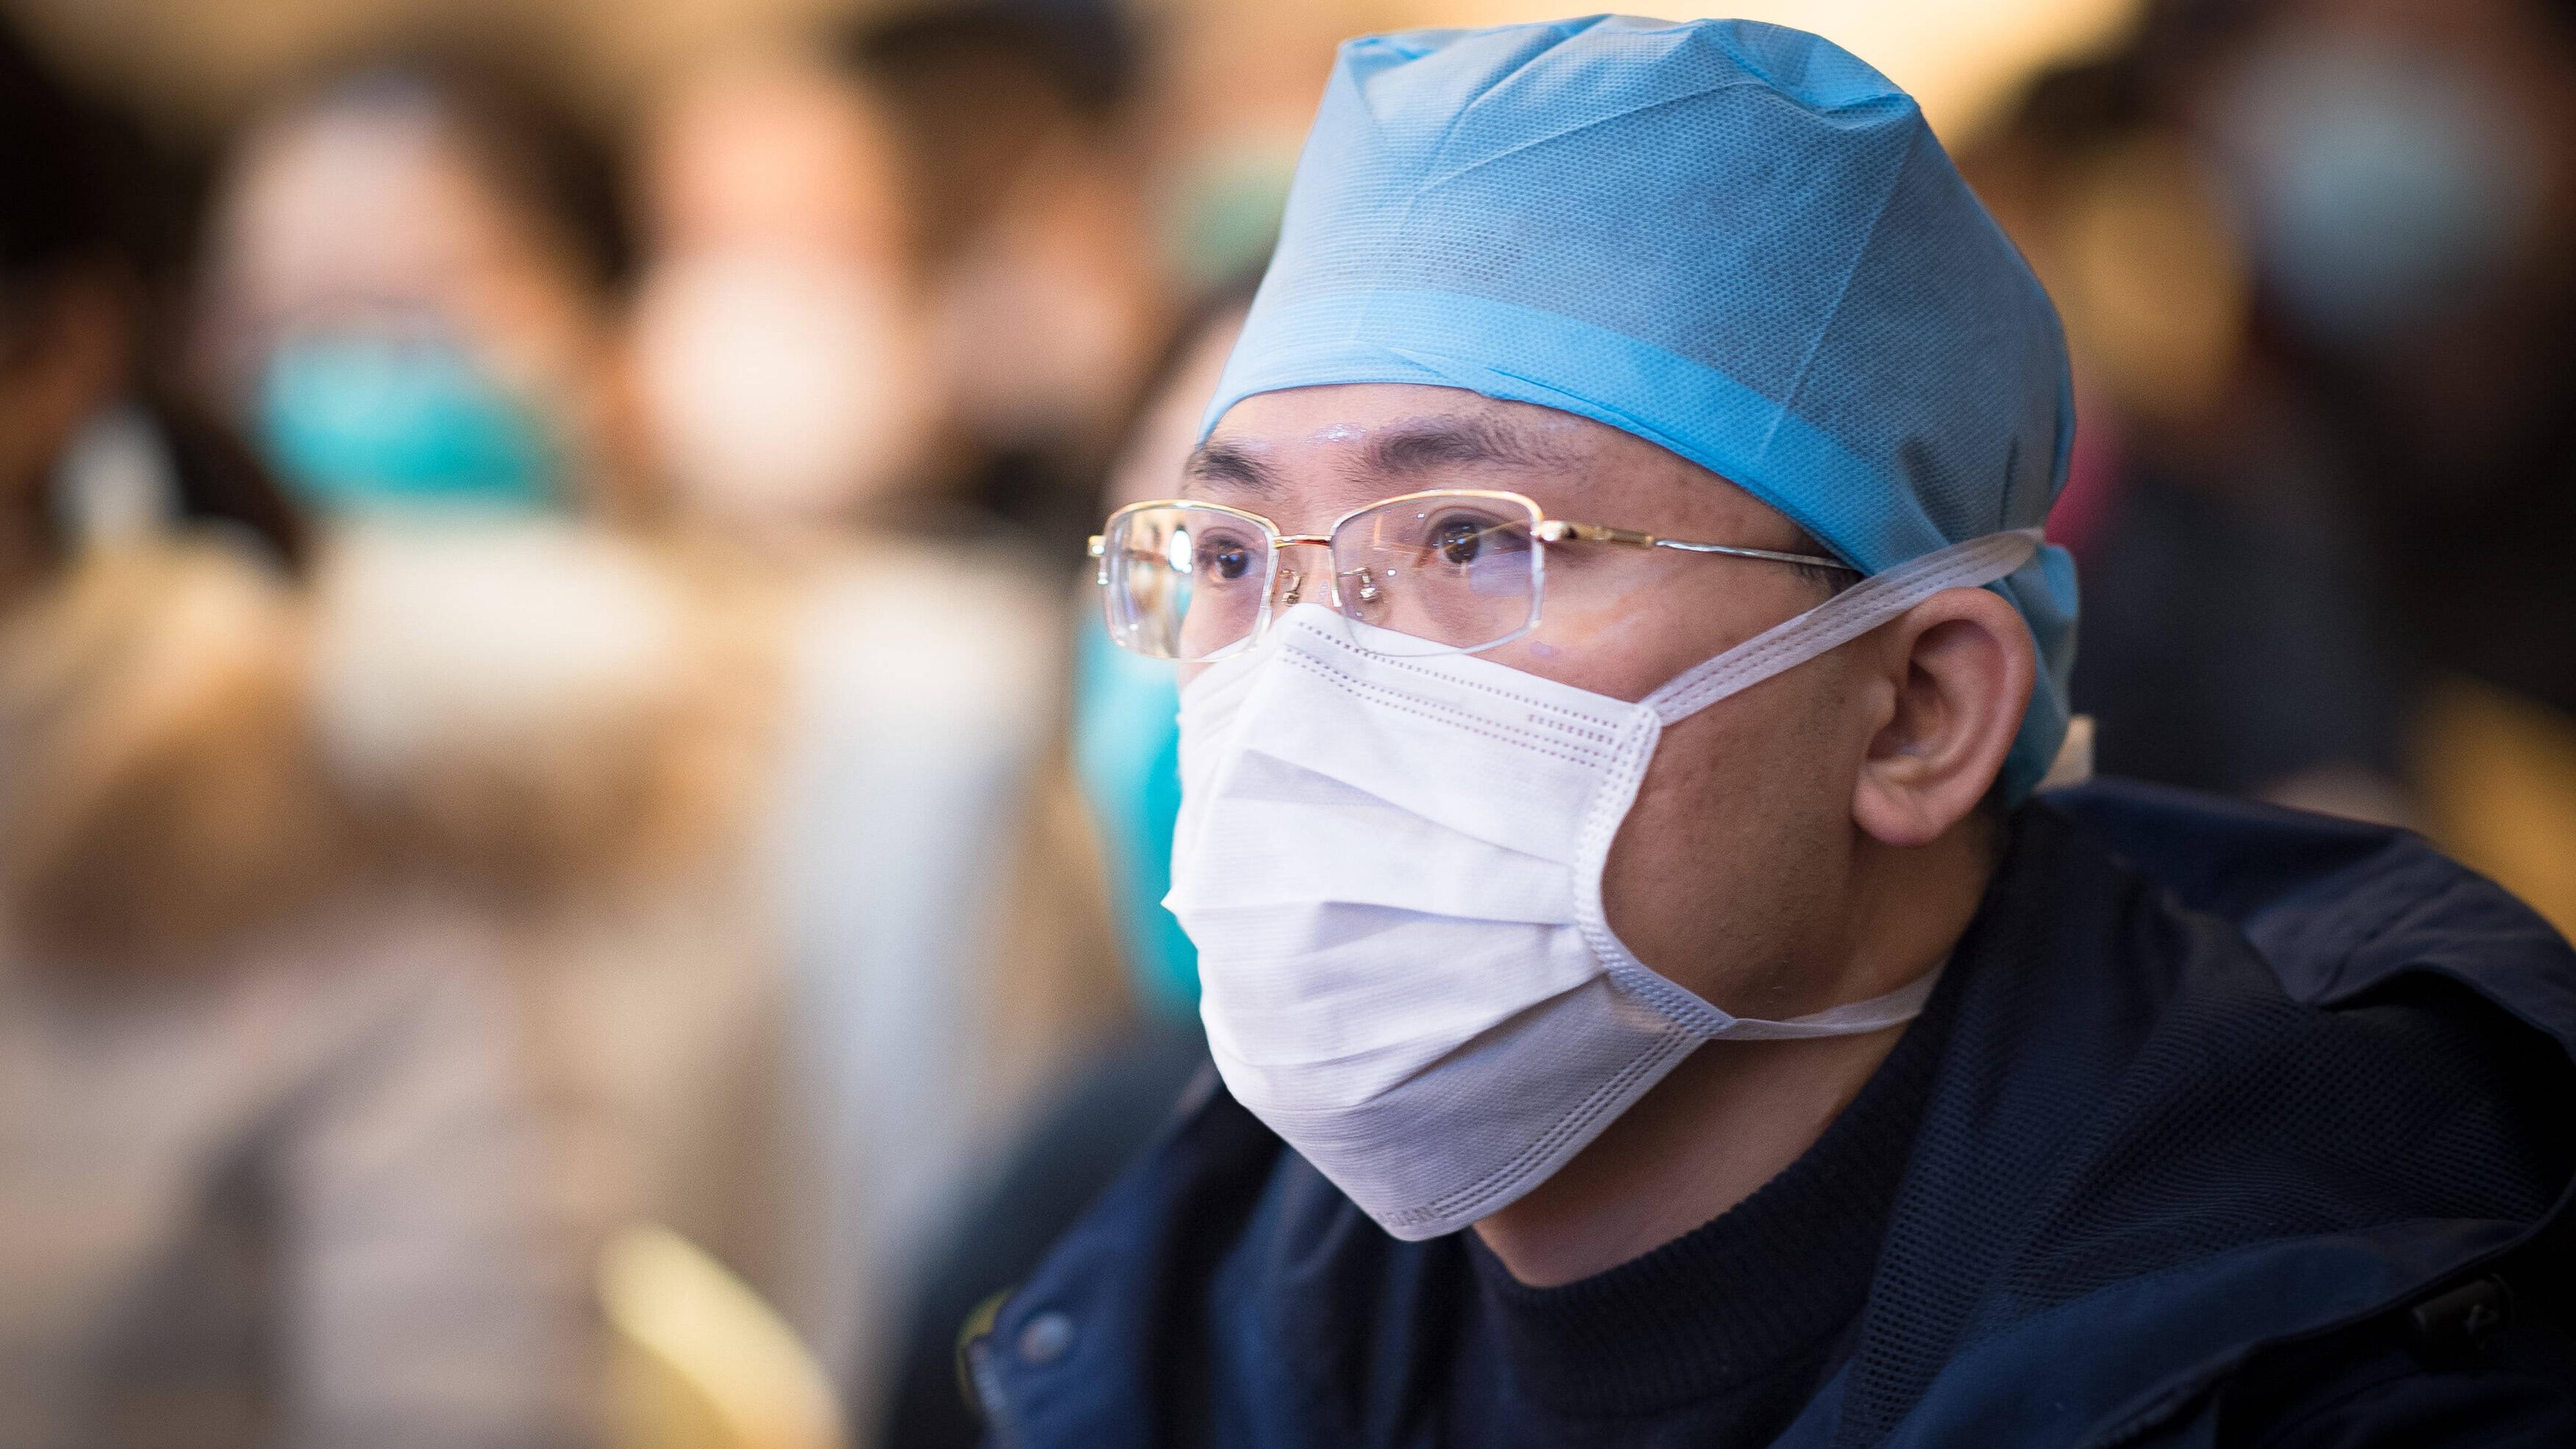 Corona-Virus: Ärzte in Wuhan müssen Windeln tragen